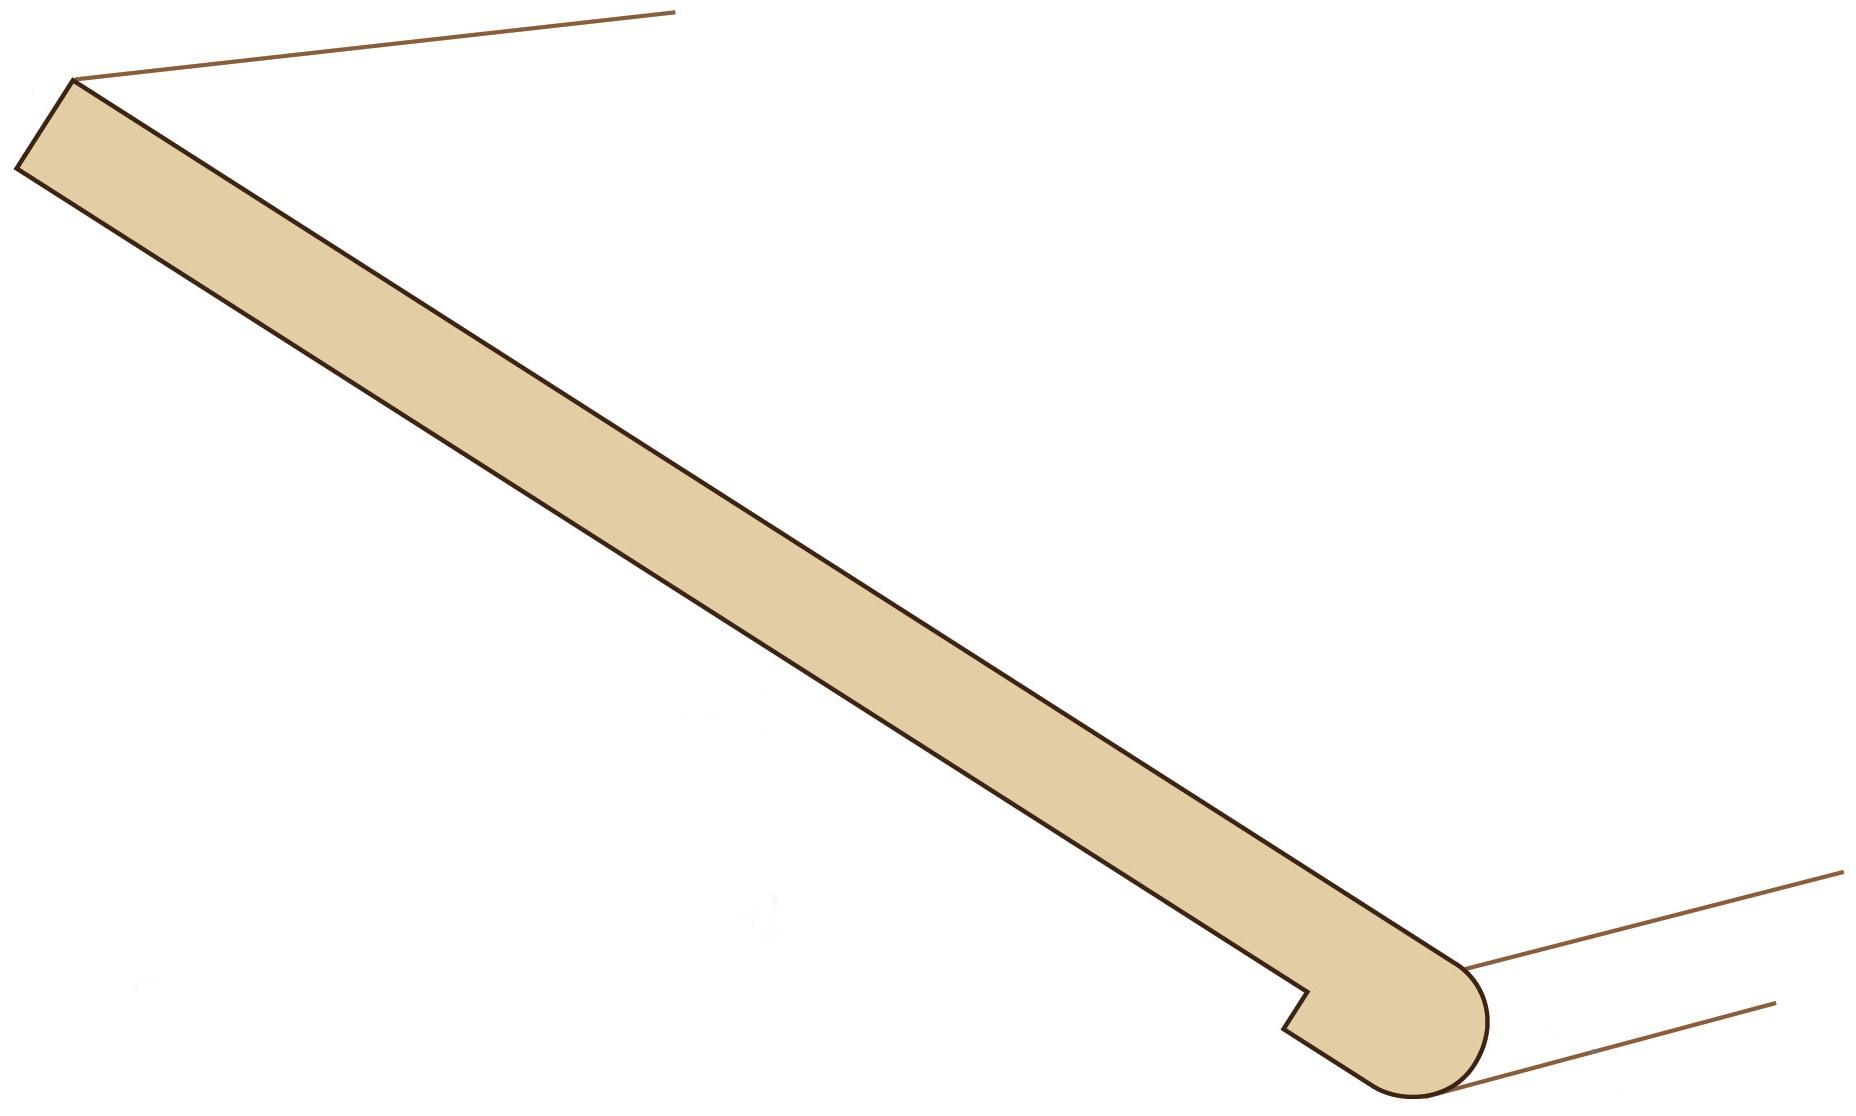 "Pine / Stair Tread / 42"" x 11 1/2"" x 3/4"" / Matte Pine Treads - Collection 0"